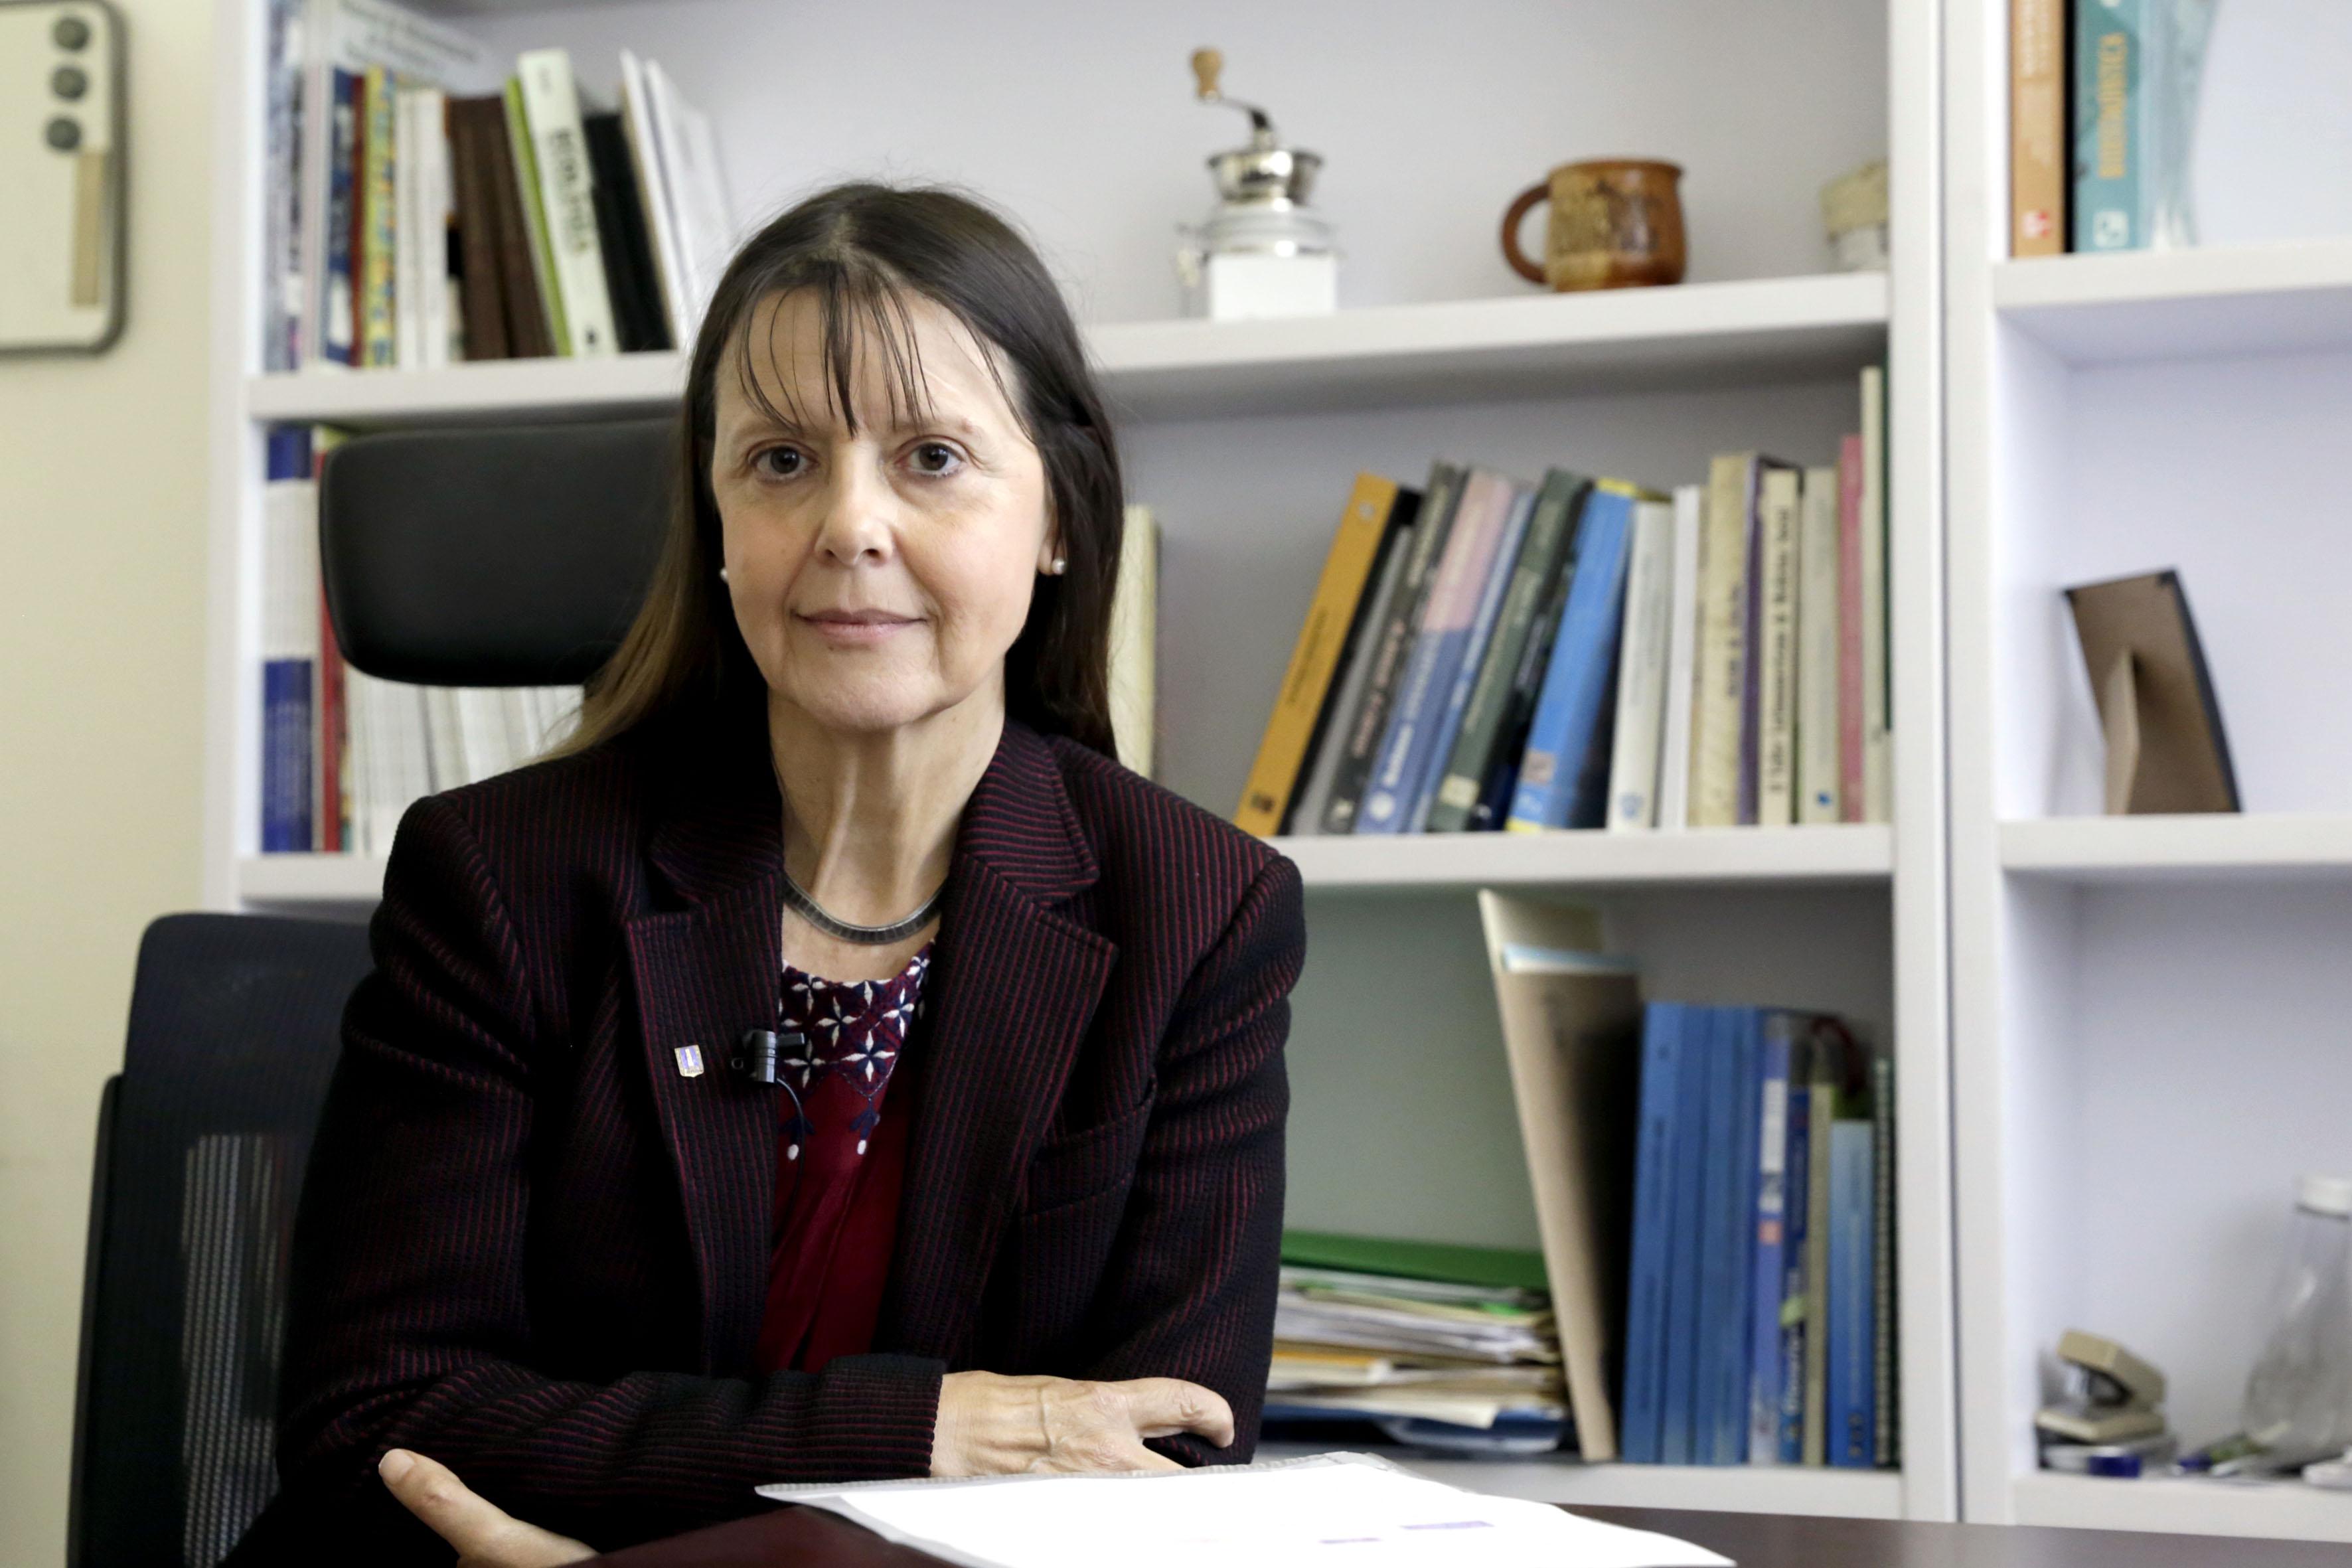 Dra. Teresita Villaseñor, Investigadora